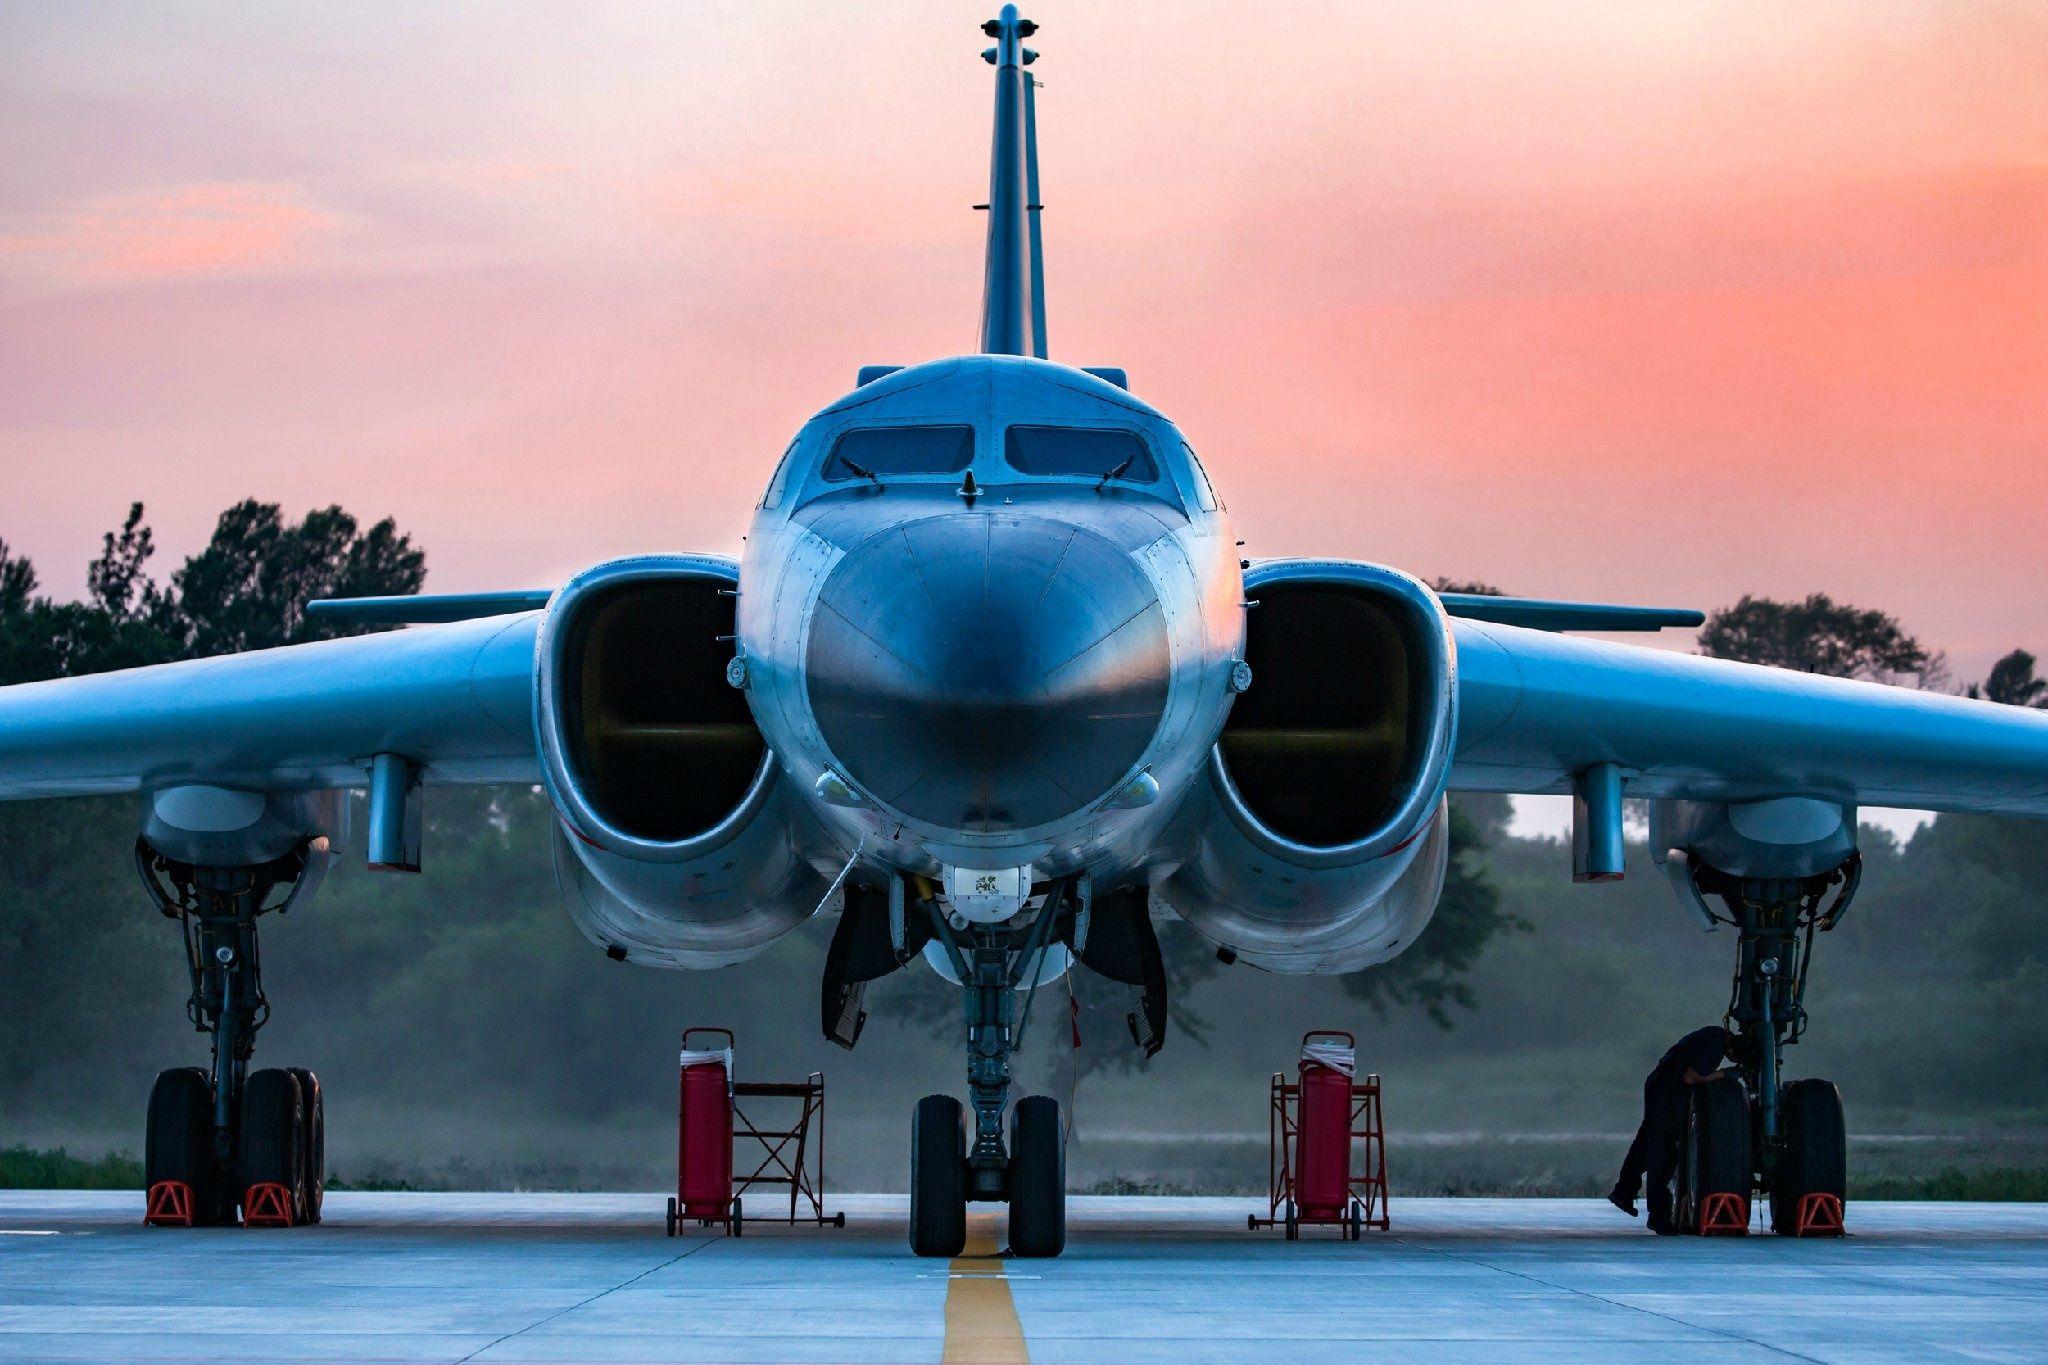 Xian H6K China Air Force Avião militar, Militares, Aviao